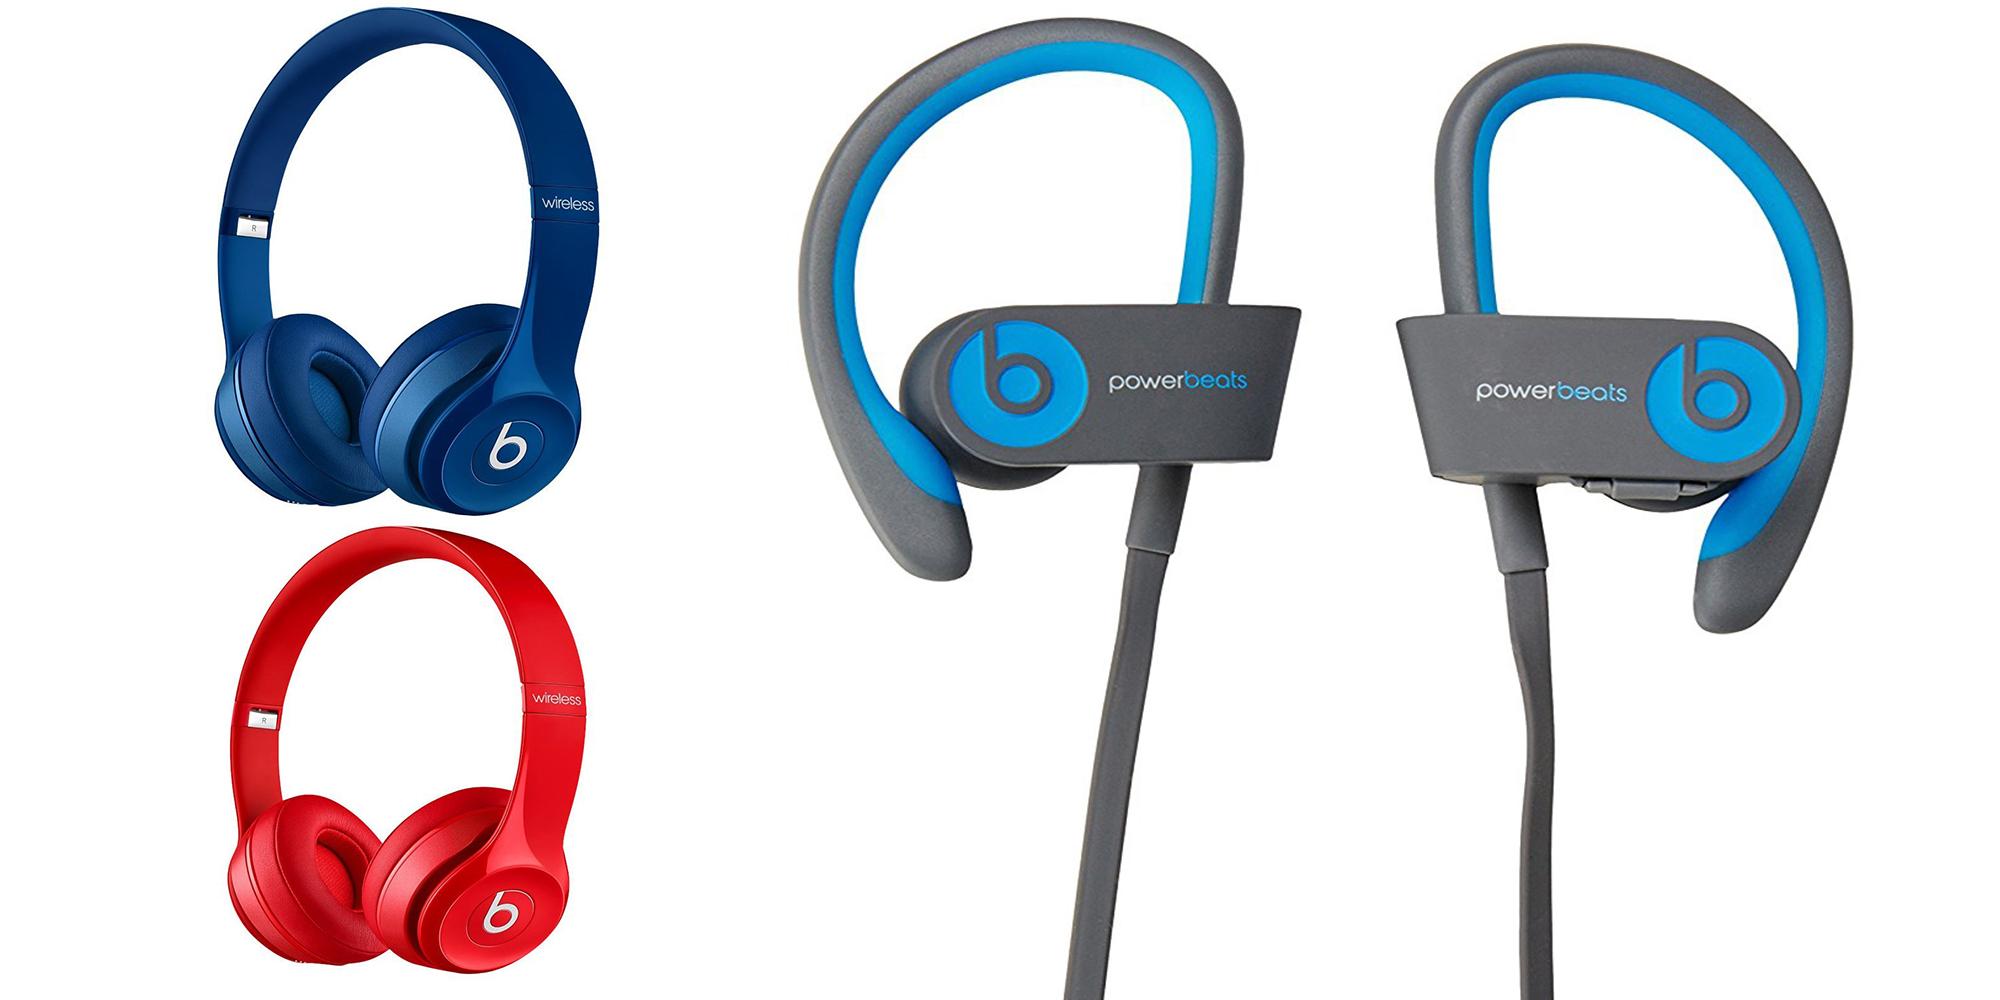 beats-by-dre-headphones